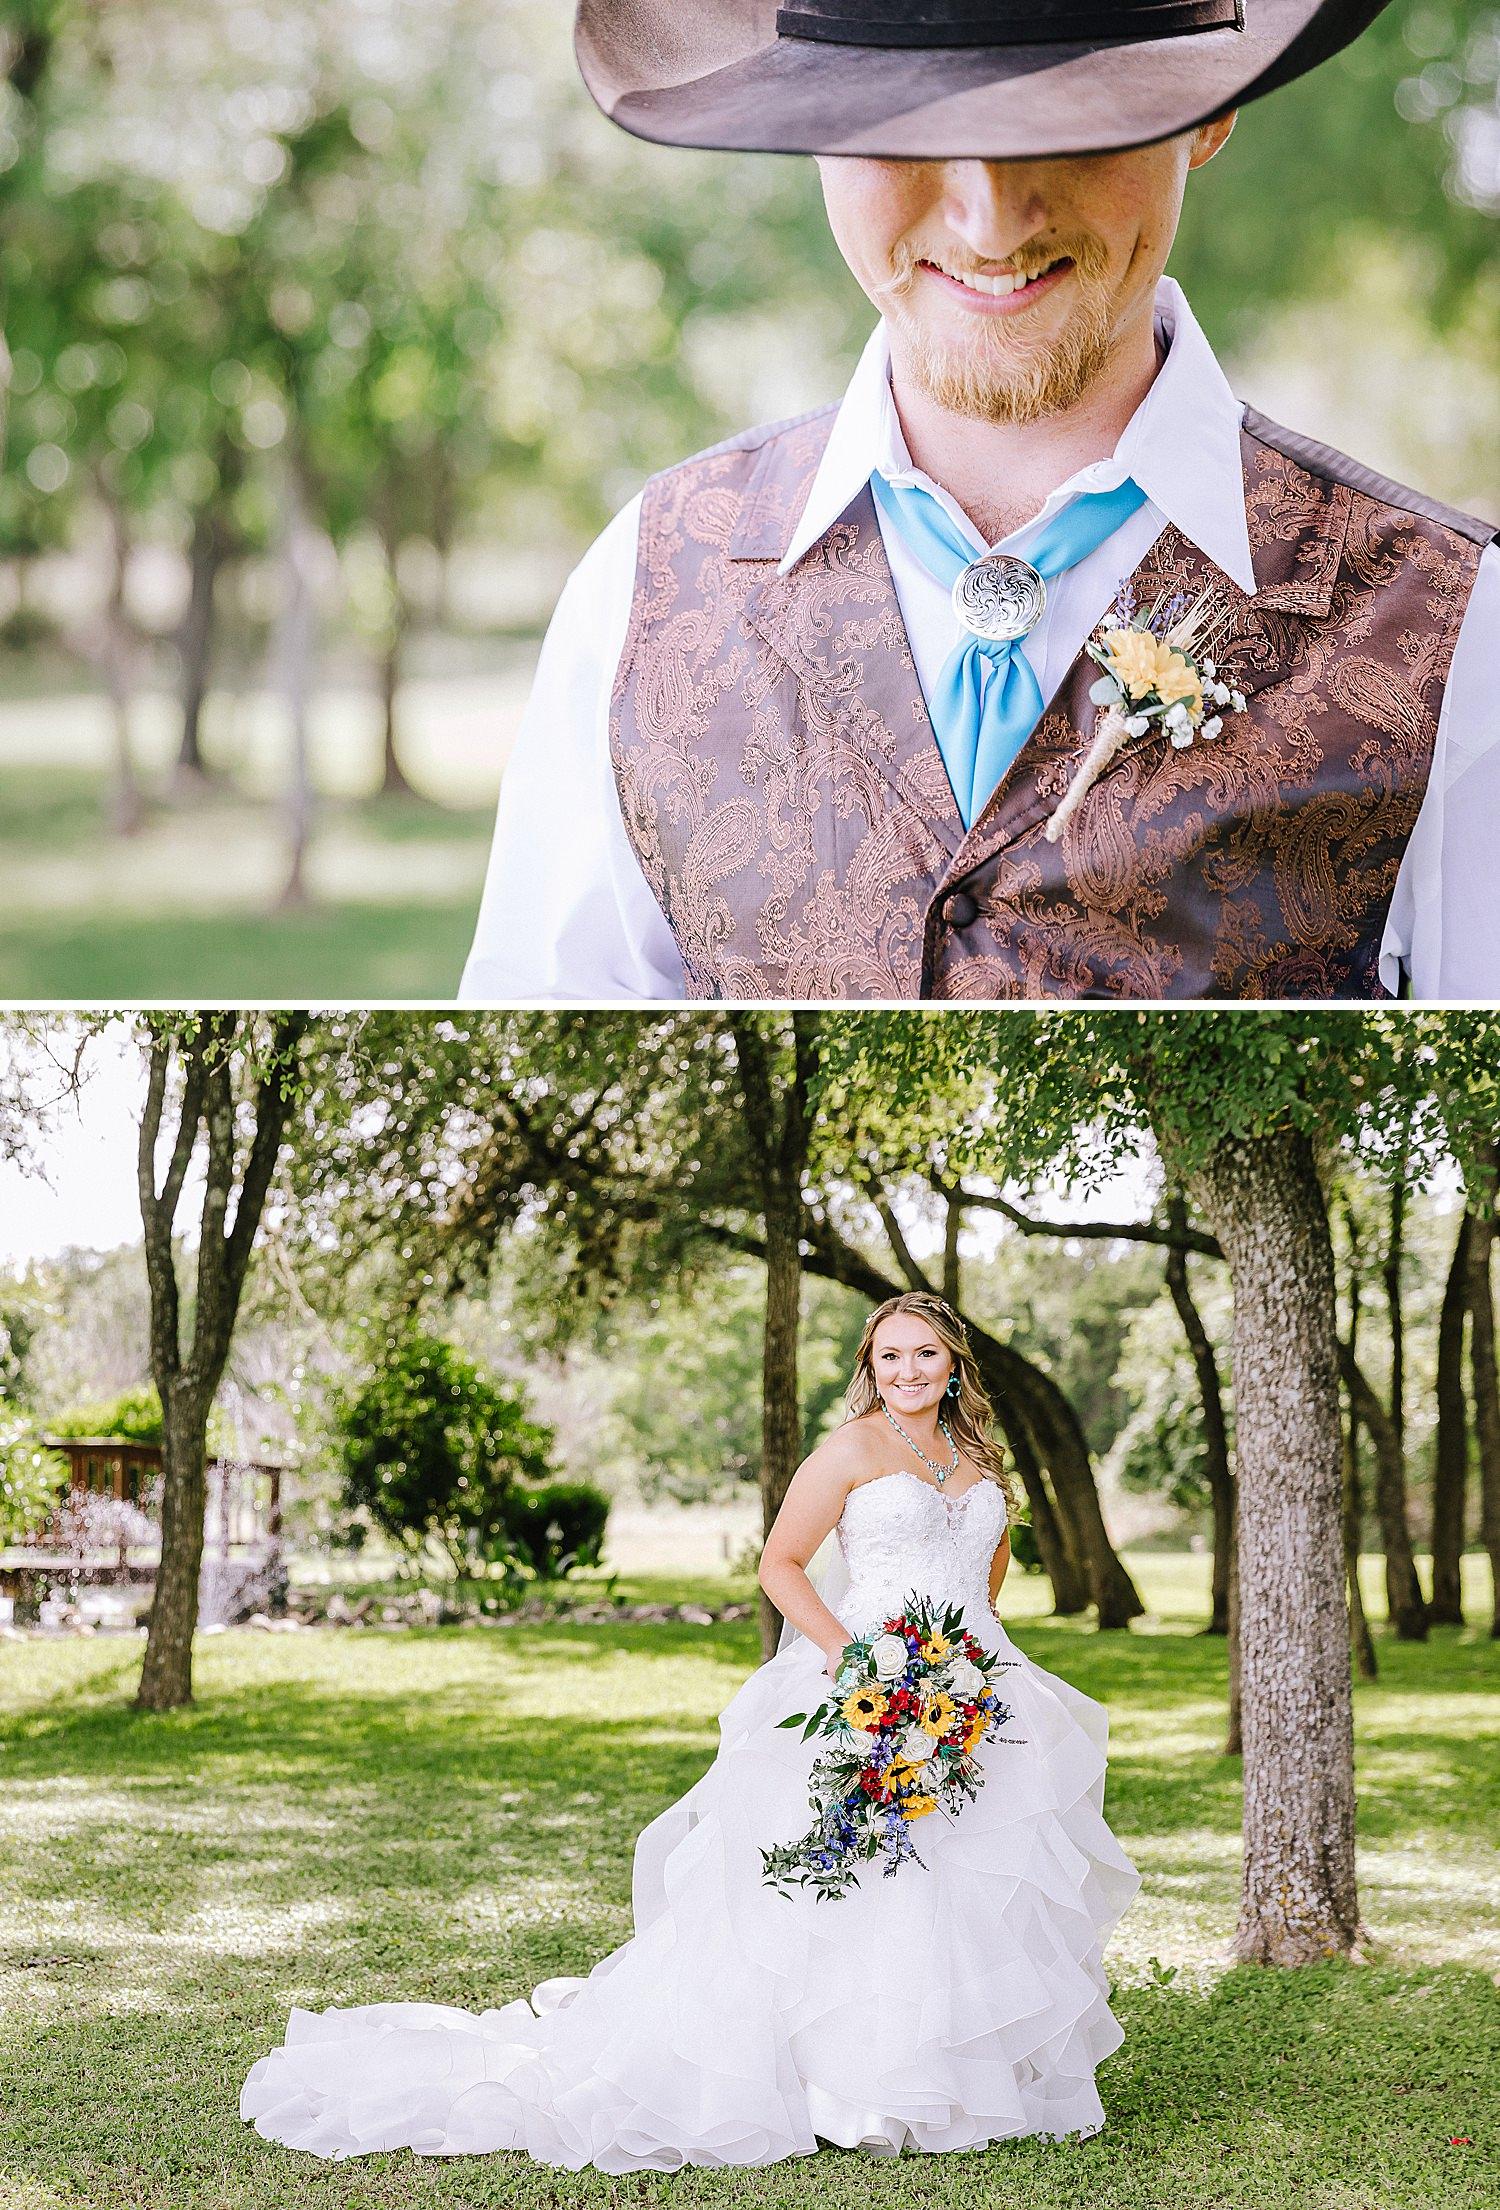 Carly-Barton-Photography-Old-Town-Texas-Rustic-Wedding-Photos-Sunflowers-Boots-Kyle-Texas_0018.jpg